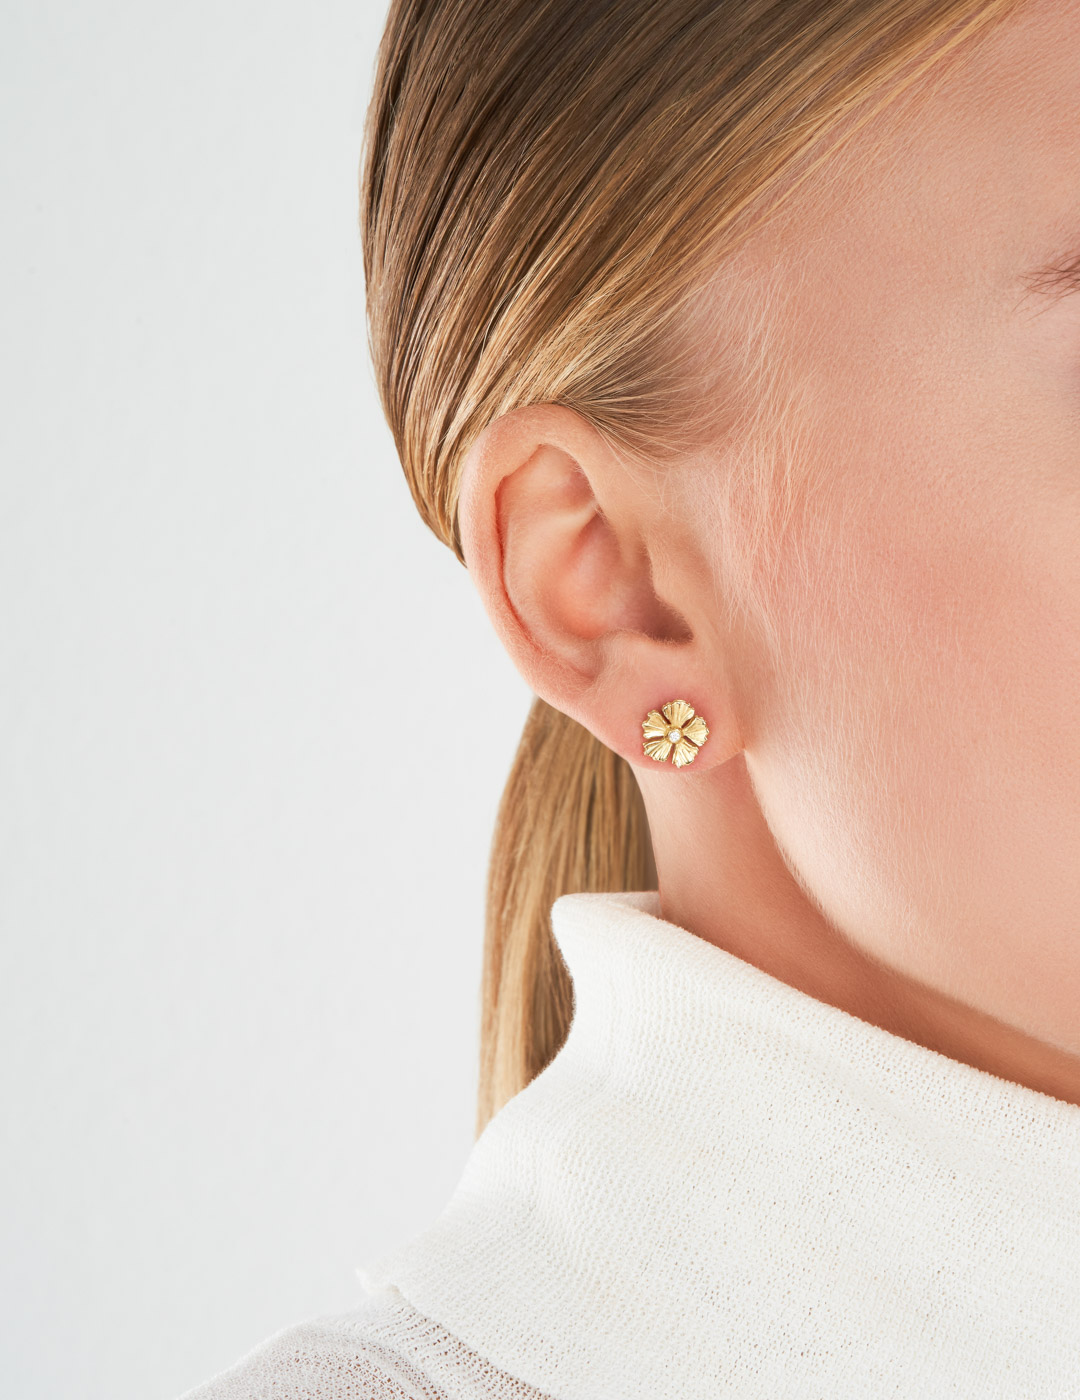 mish_products_earrings_StrwFlr-Sm-Stud-ER-2